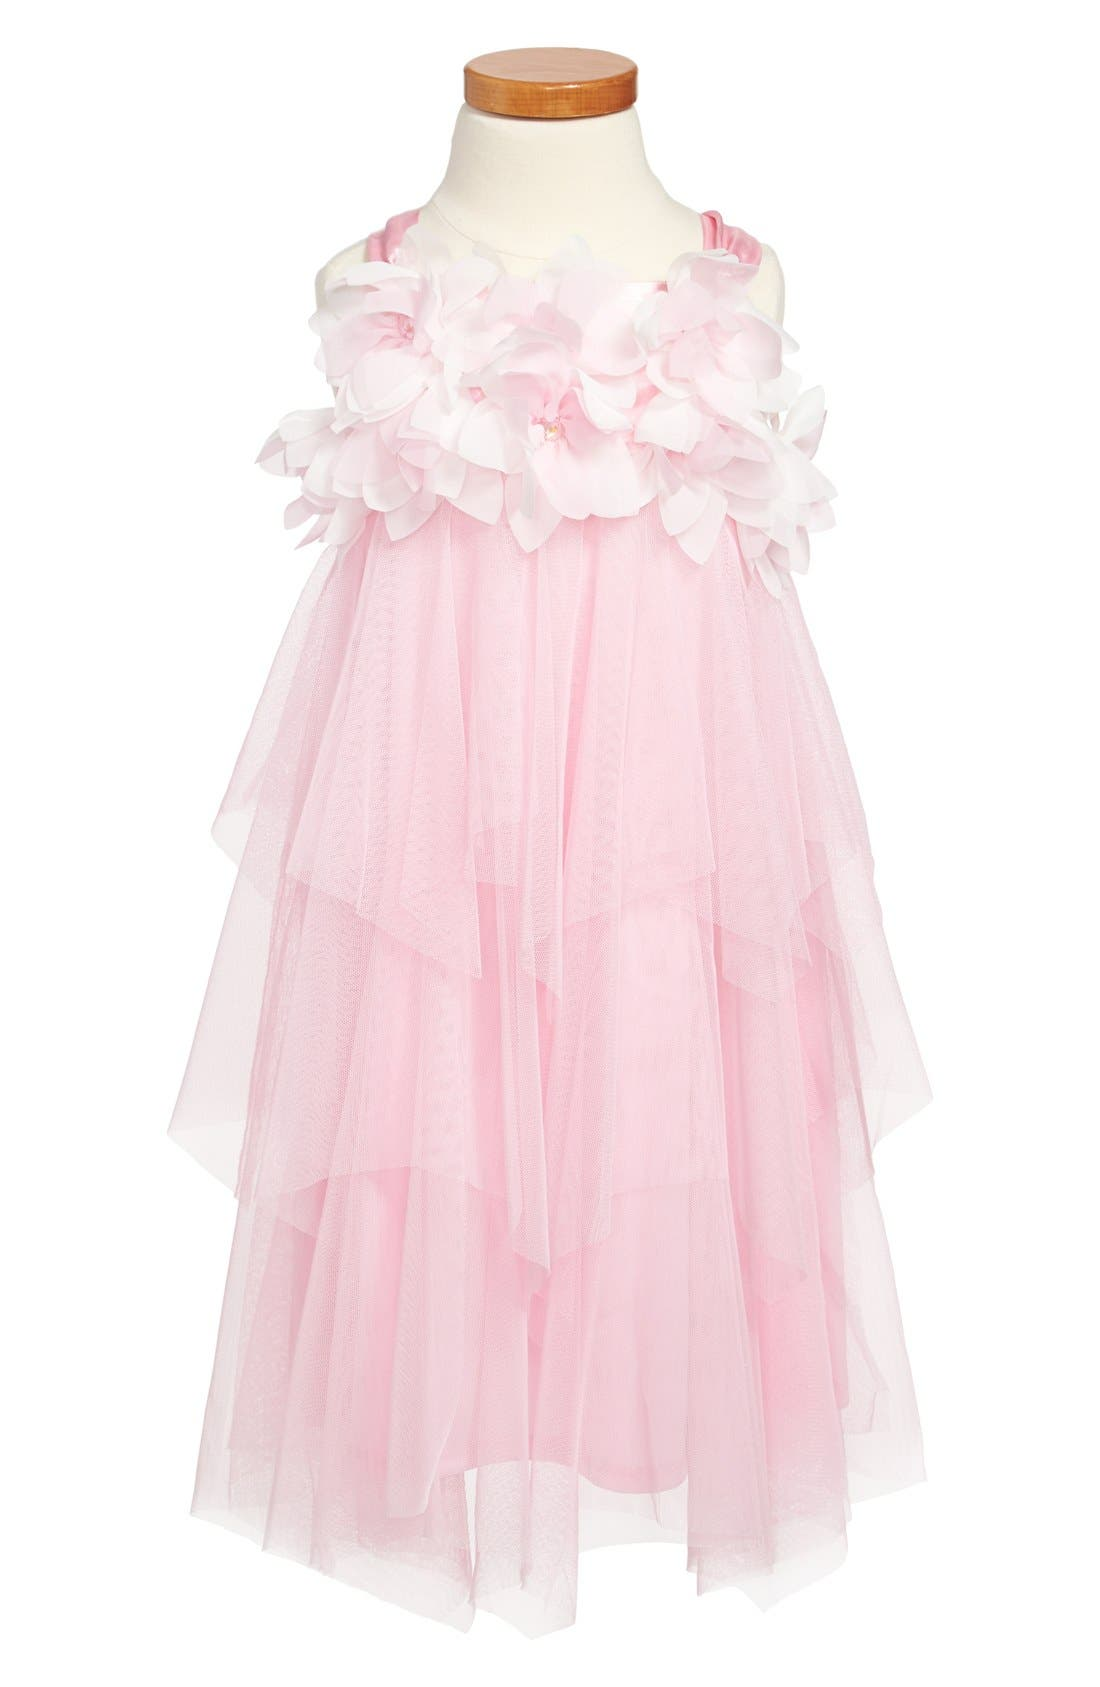 Main Image - Biscotti Floral Tiered Dress (Little Girls & Big Girls)